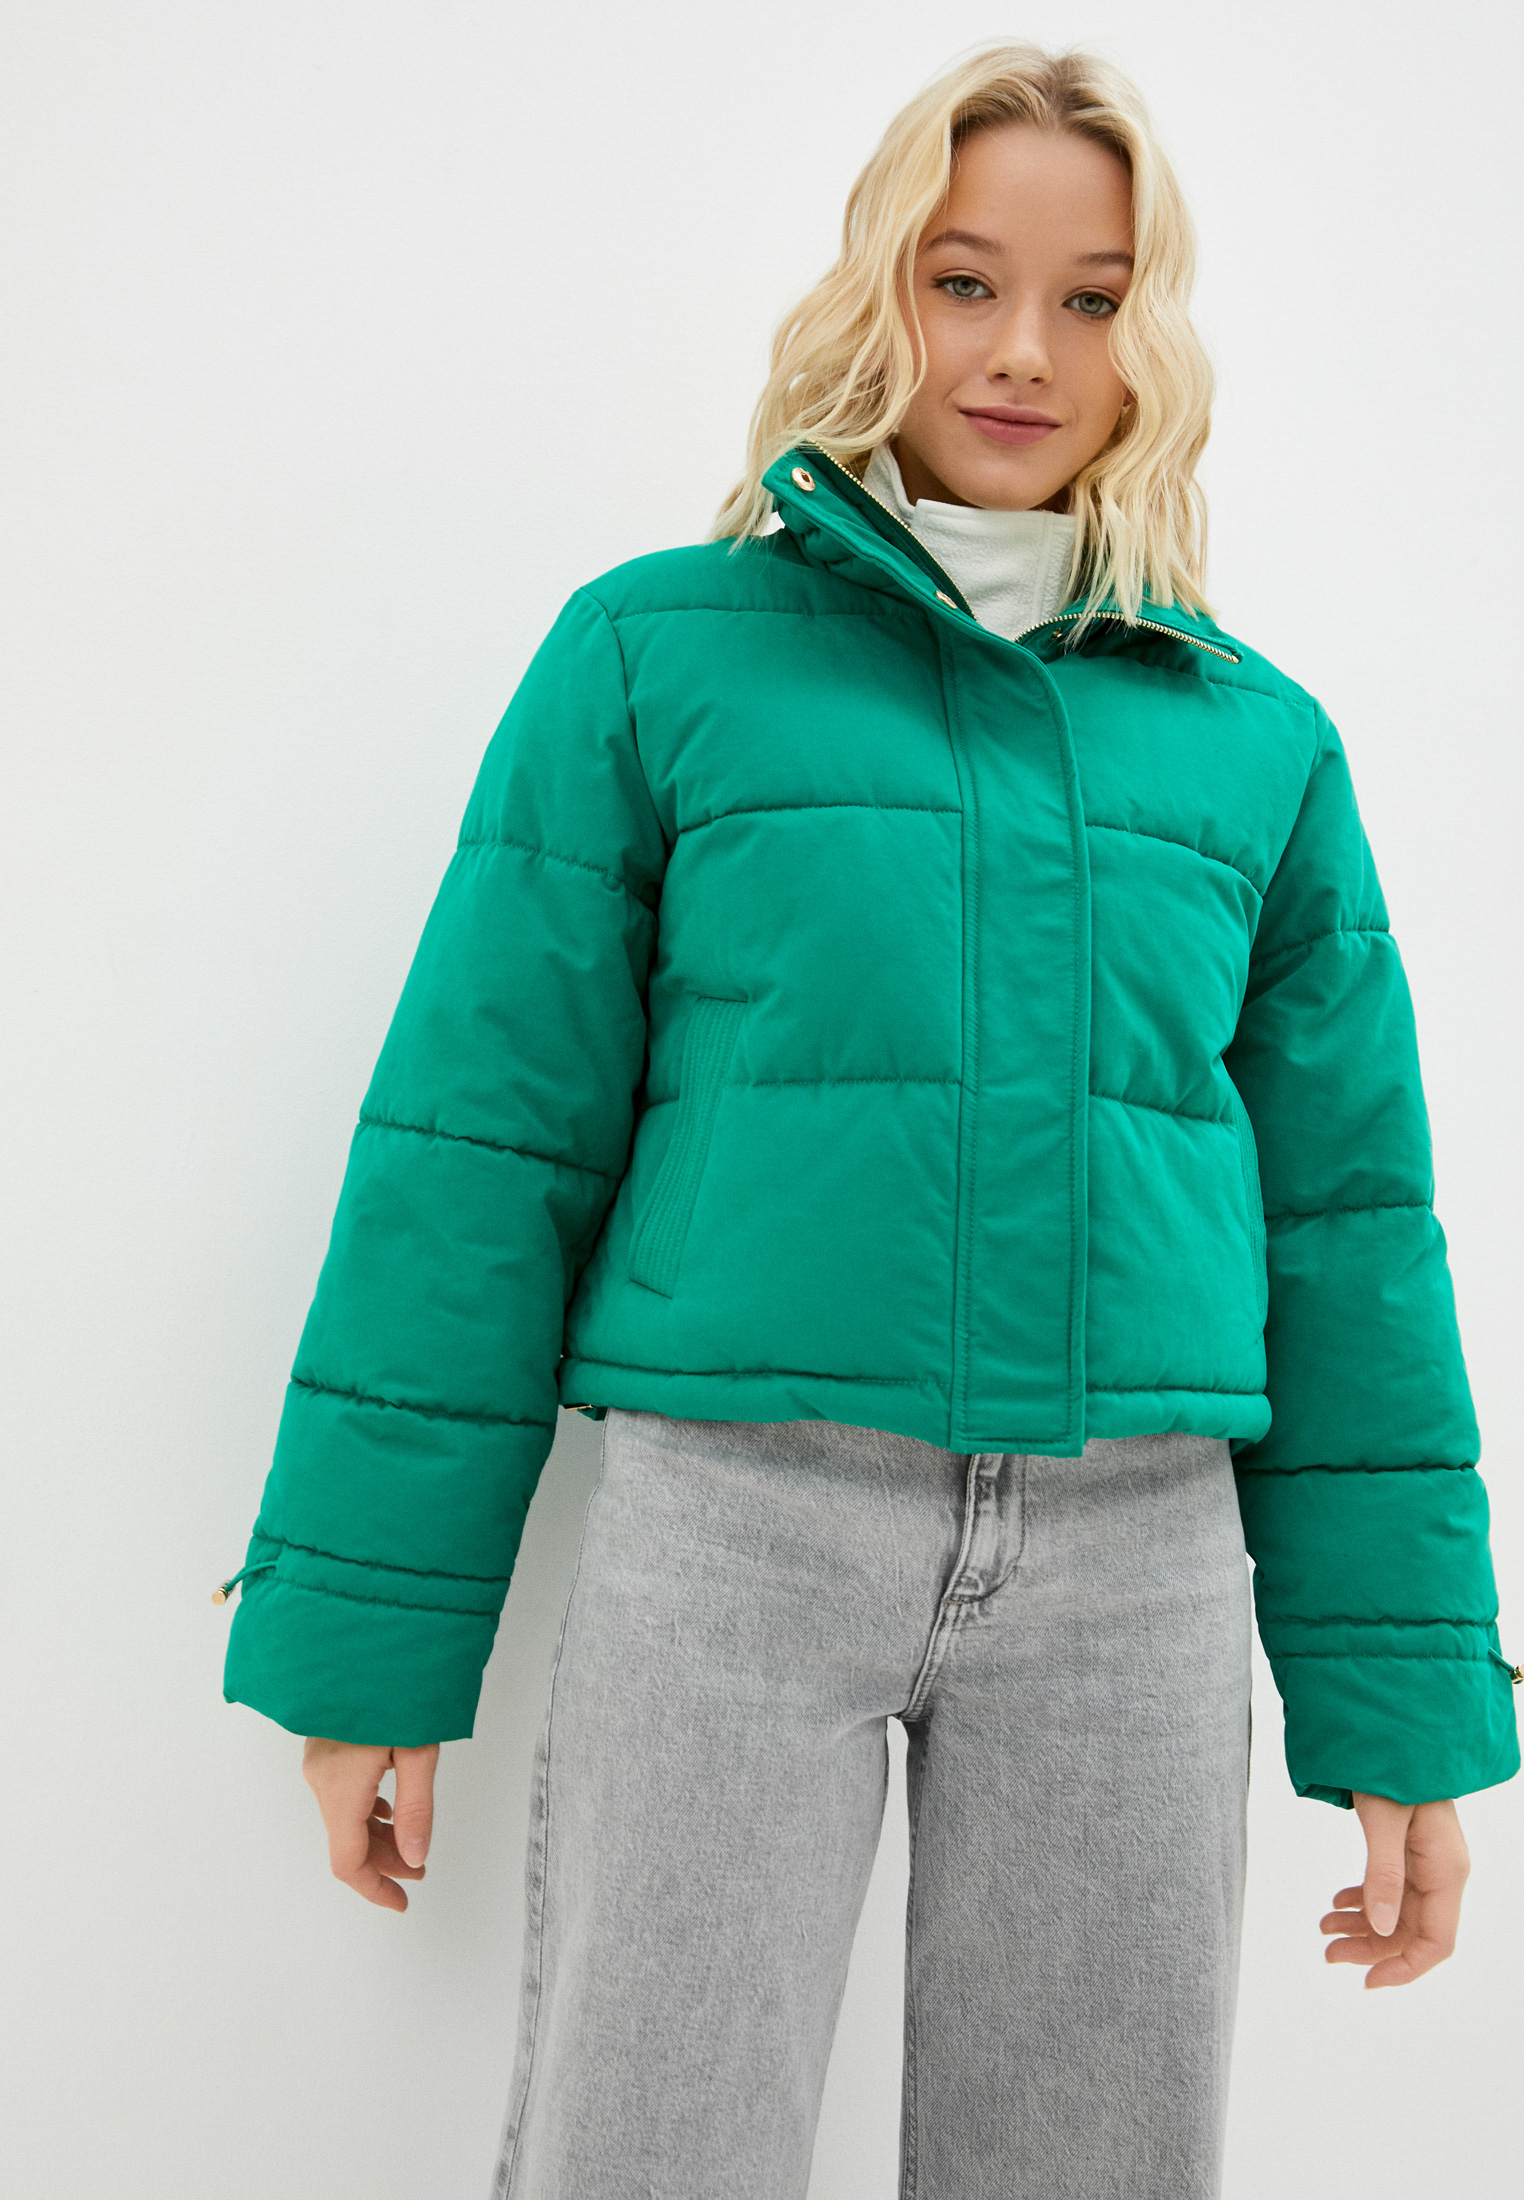 Утепленная куртка Pimkie Куртка утепленная Pimkie